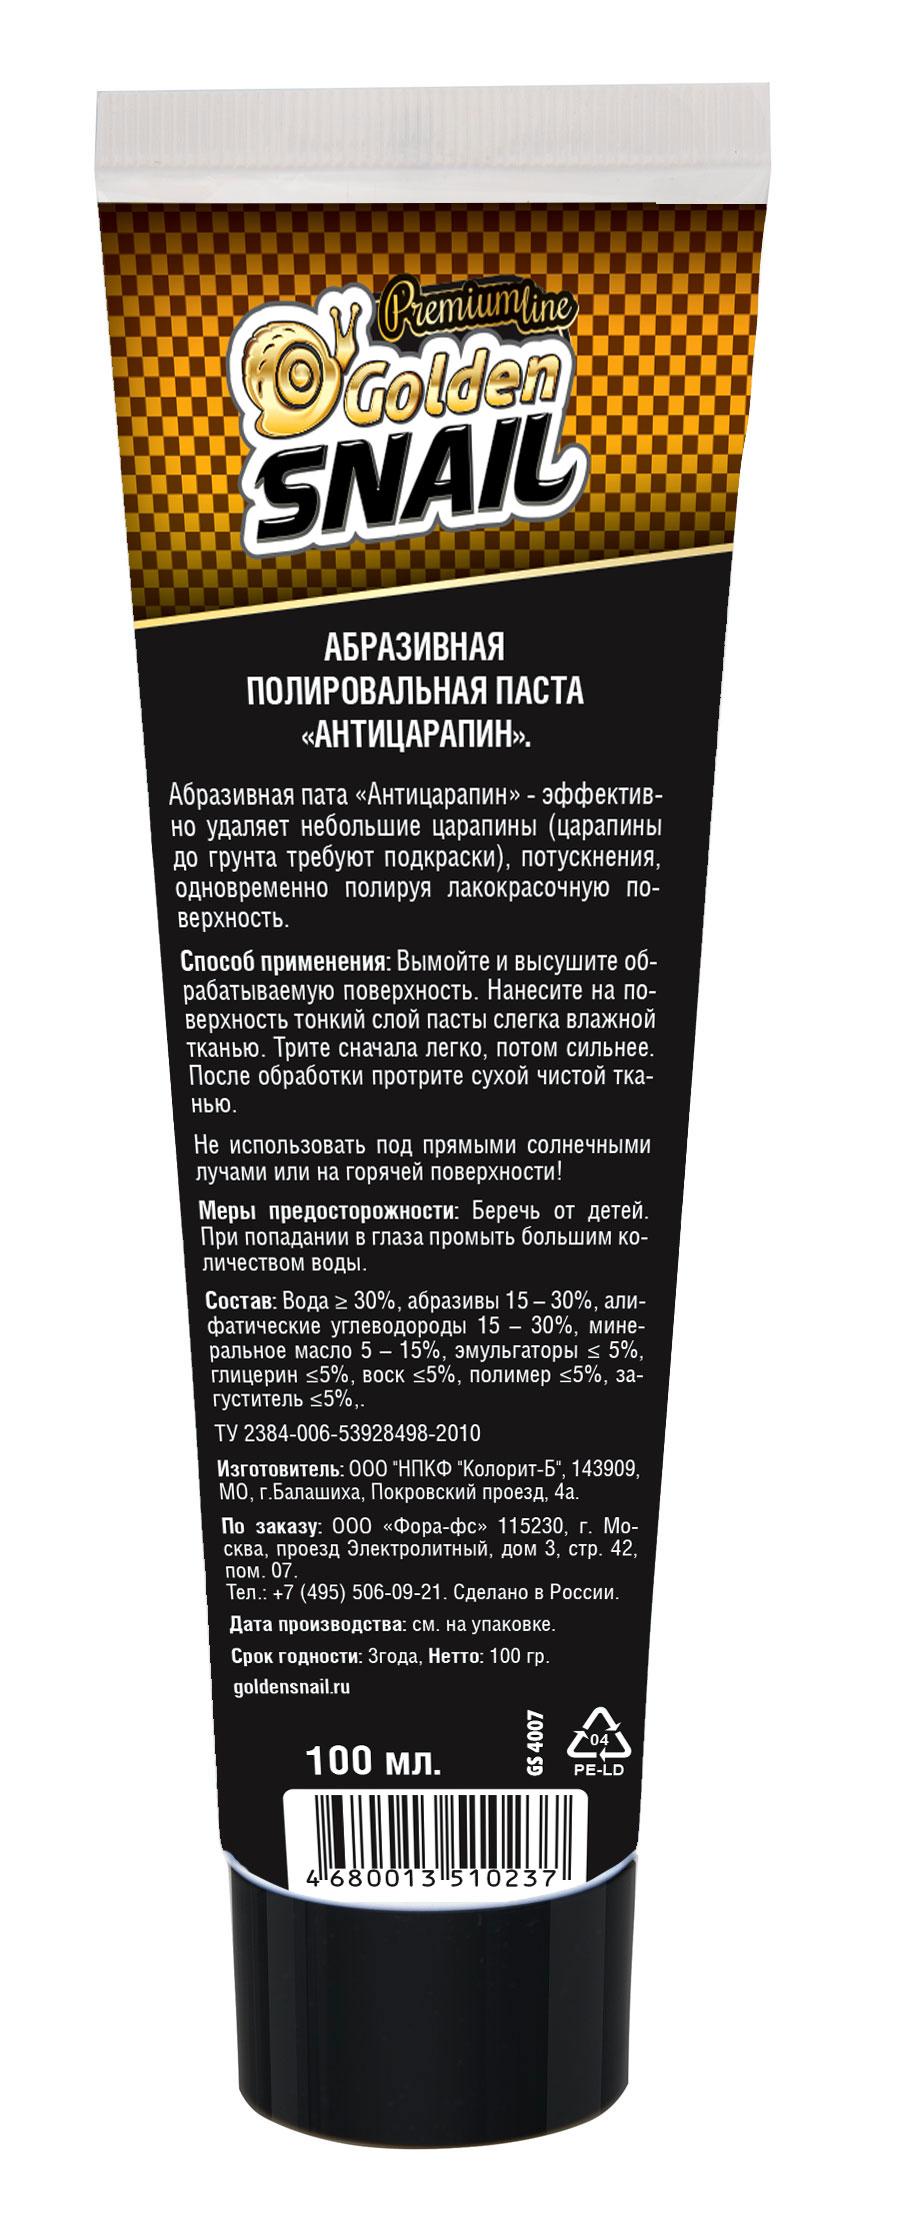 Абразивная полировальная паста «антицарапин».